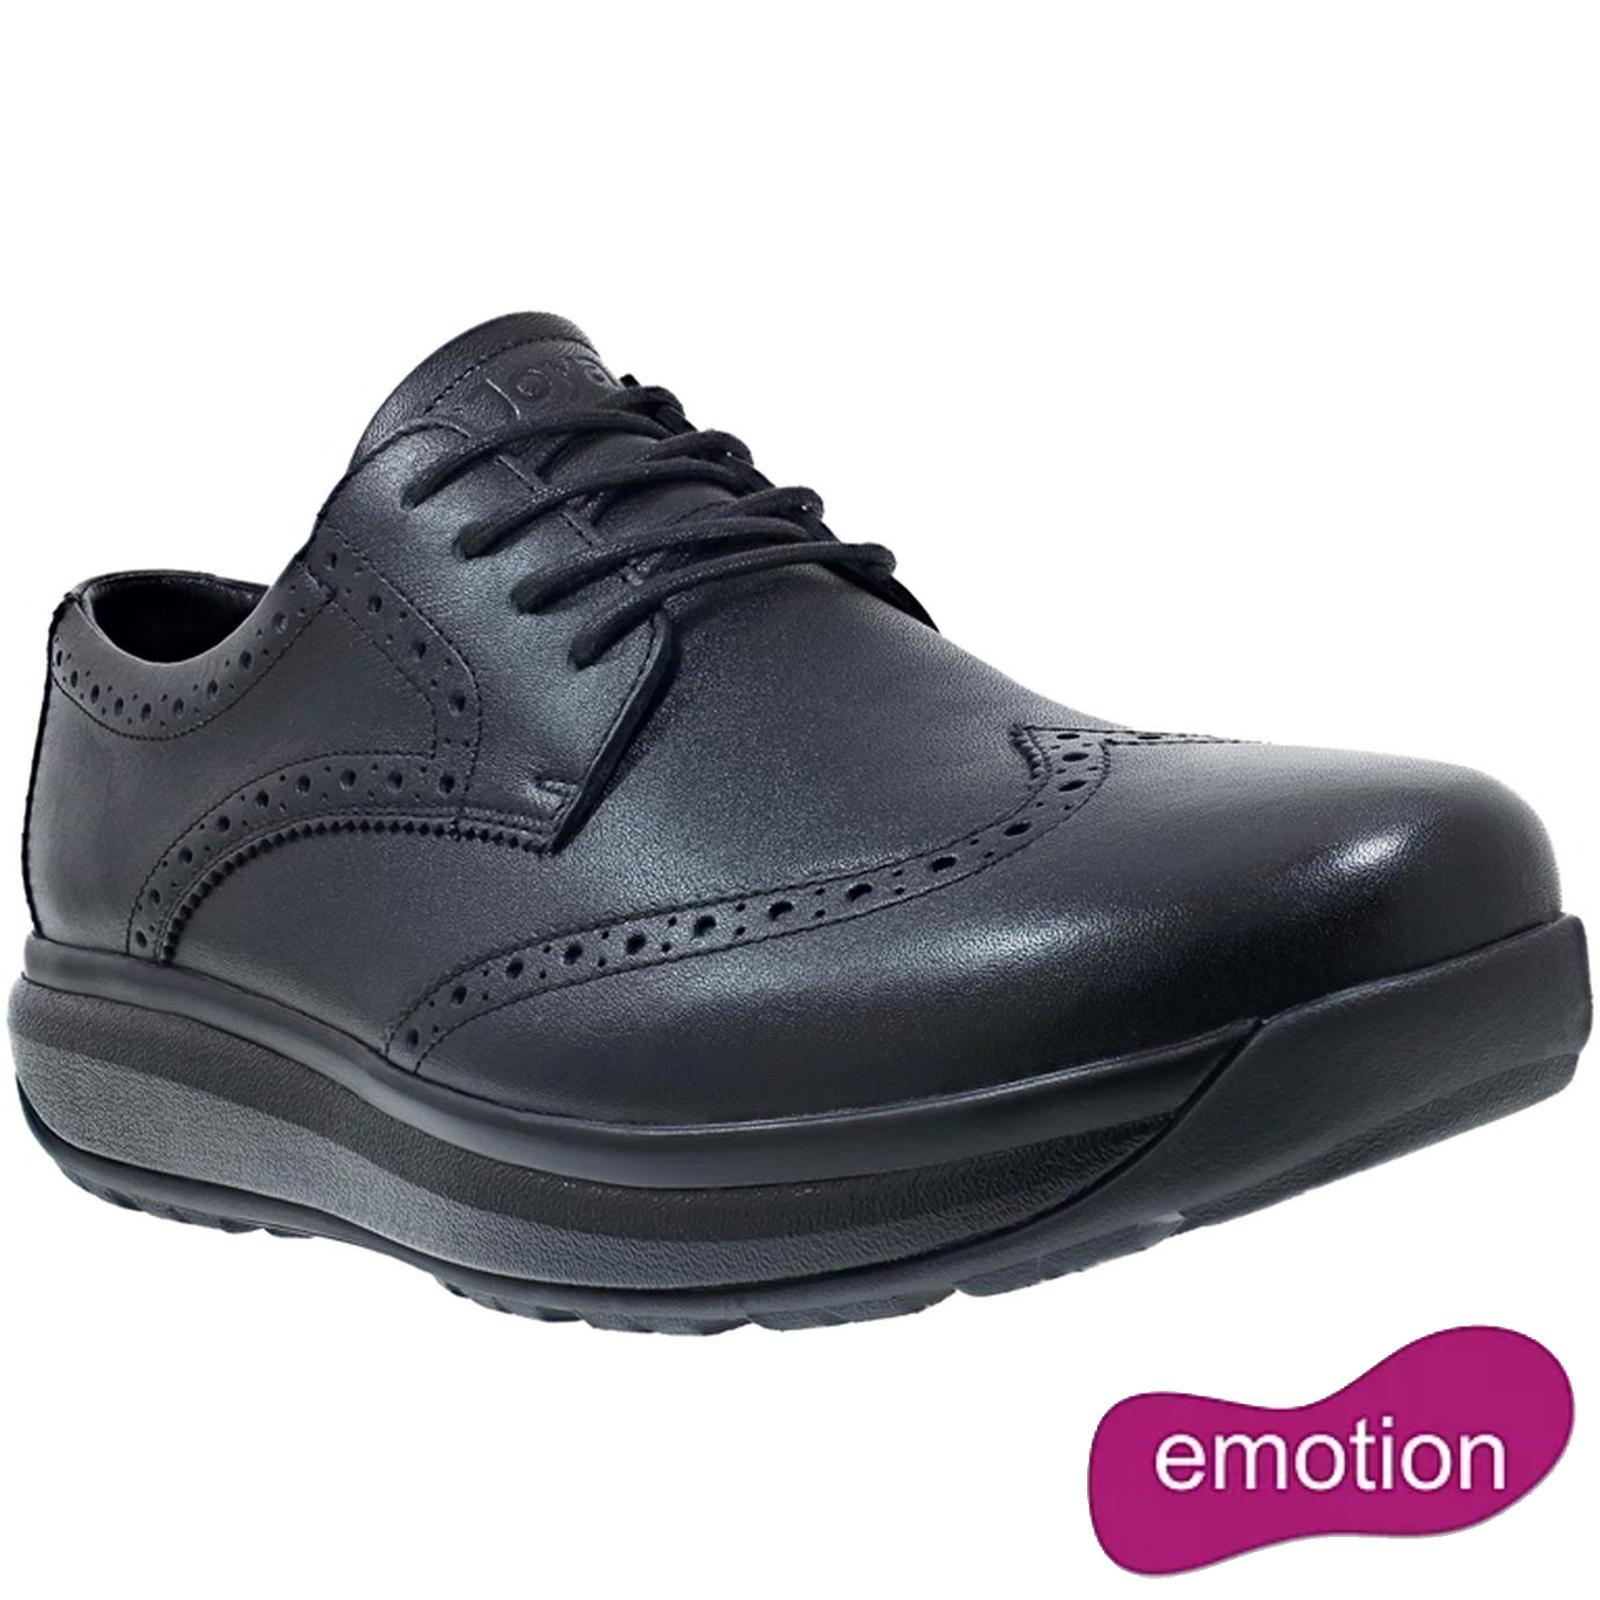 Joya Mens Paso Fino II Formal Leather Shoes - Black